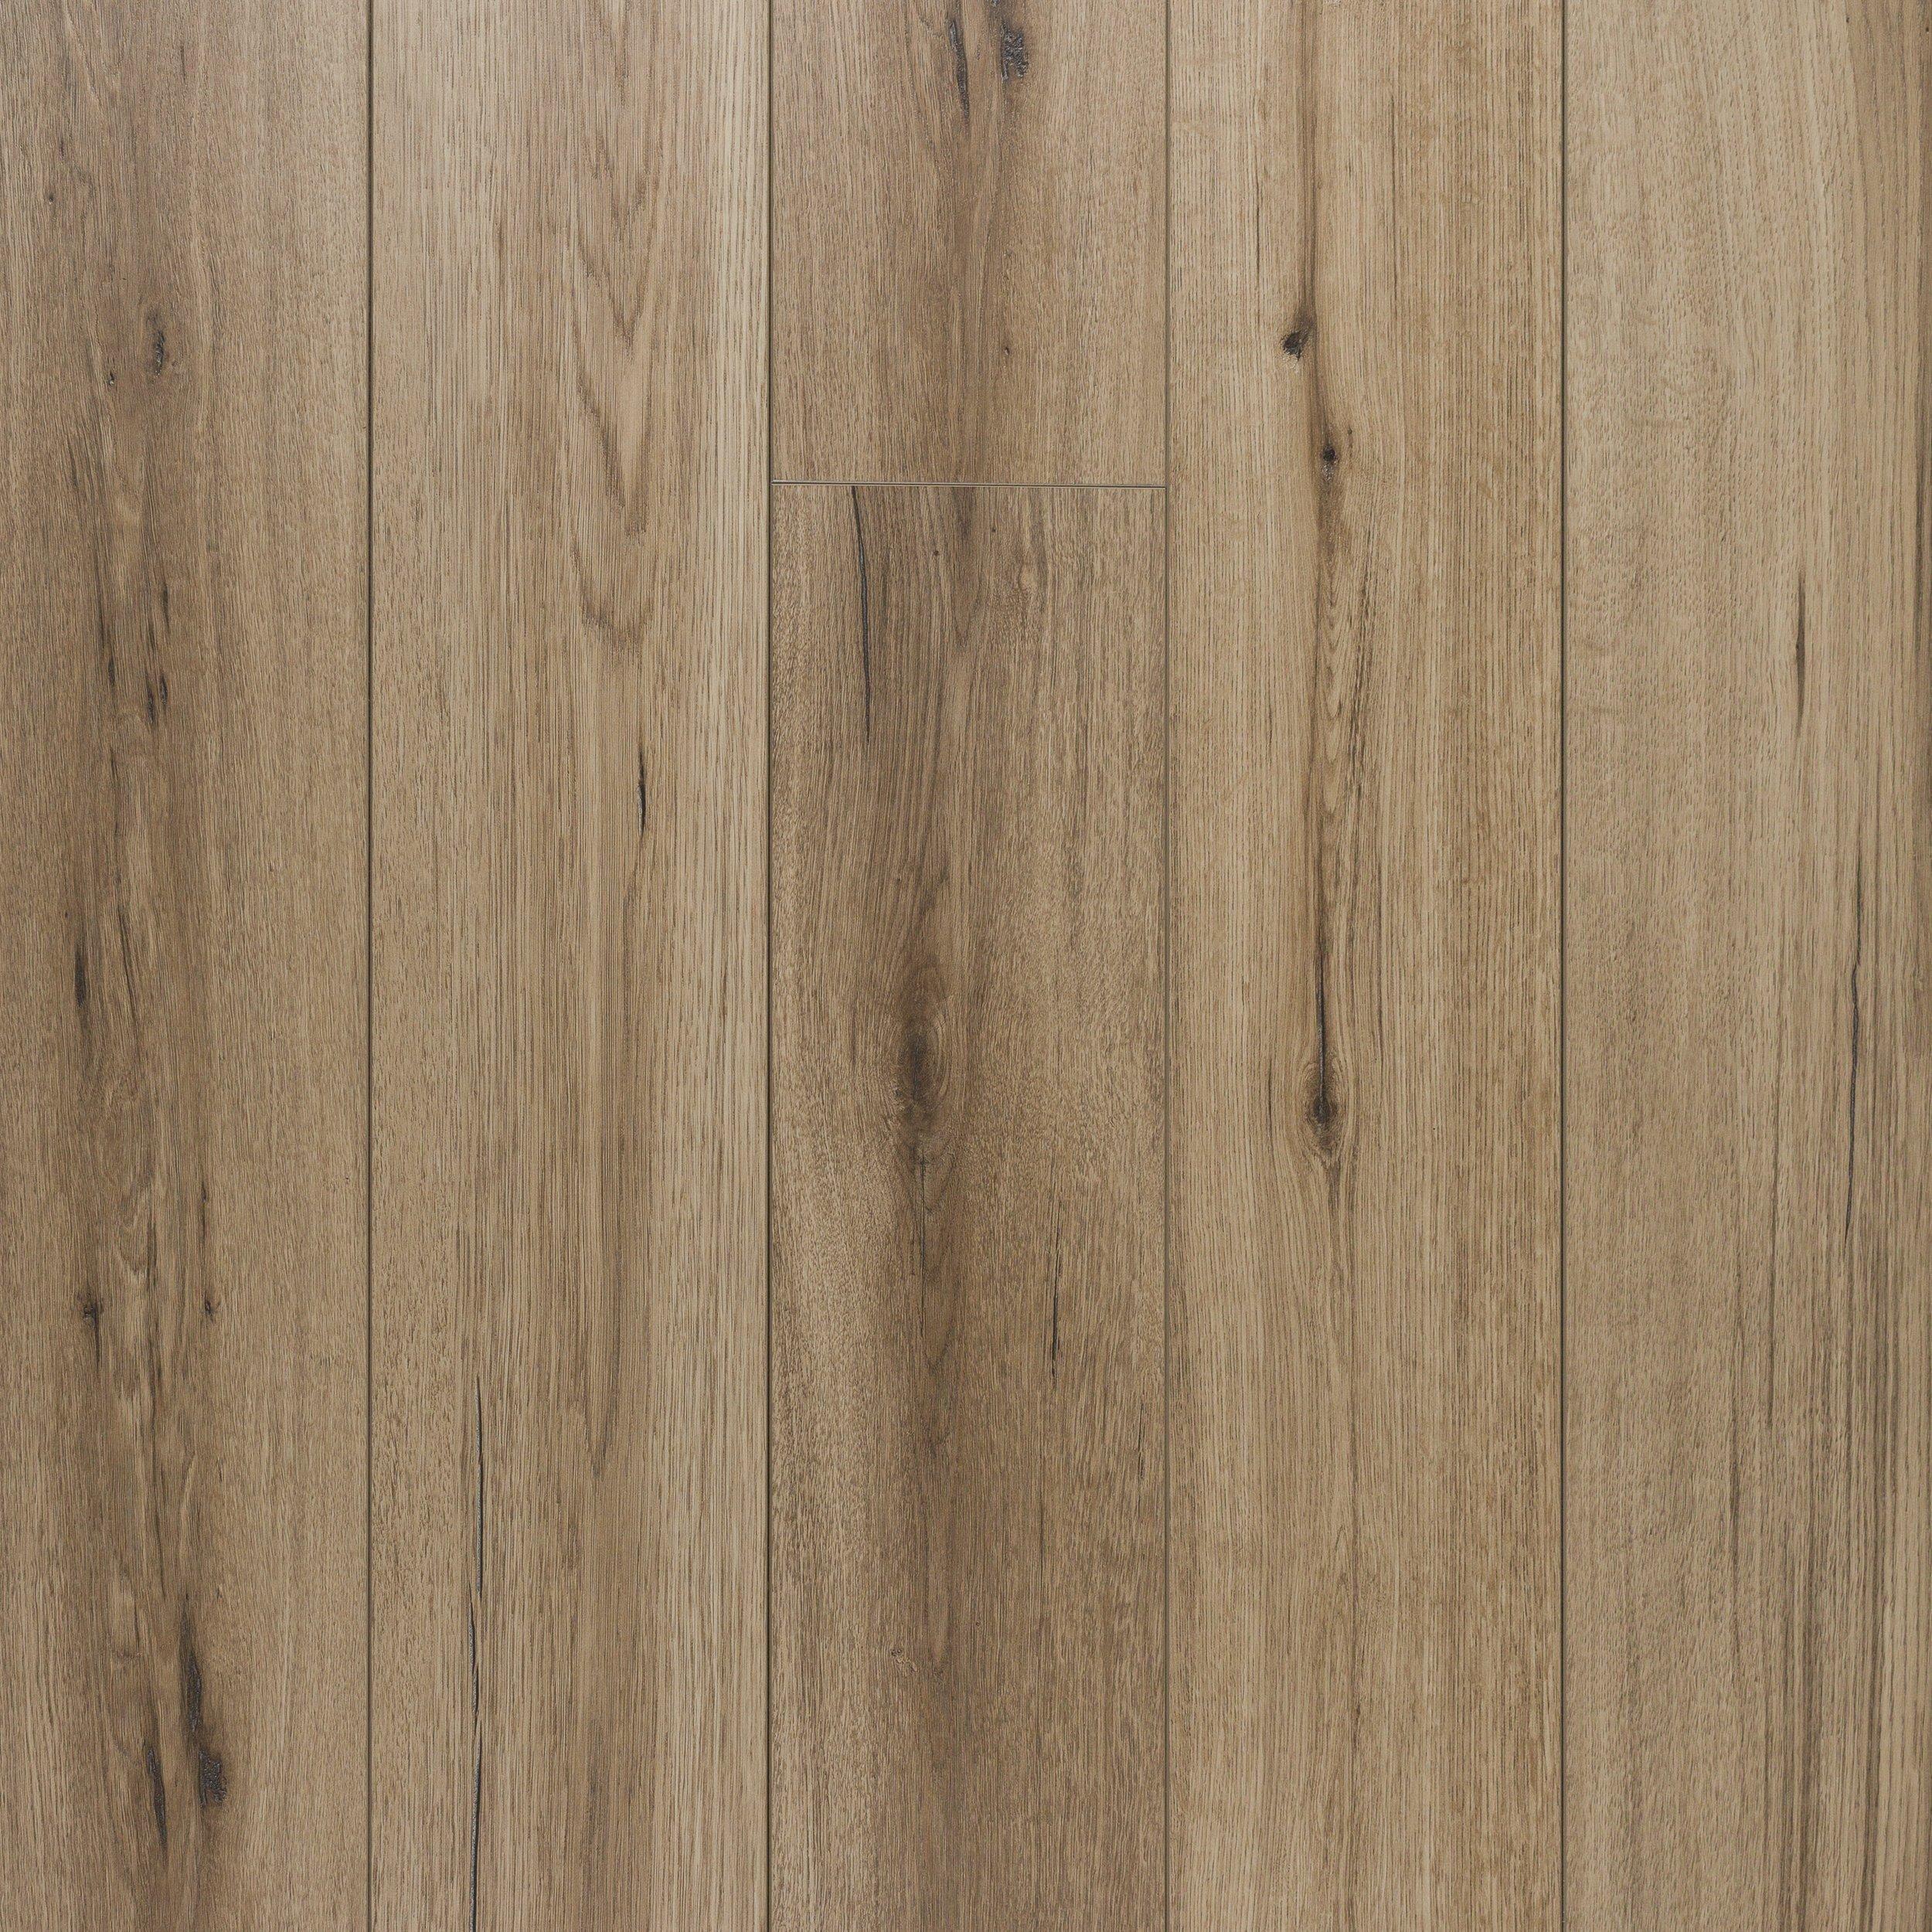 Cassata Water Resistant Laminate Flooring Floor Decor Hardwood